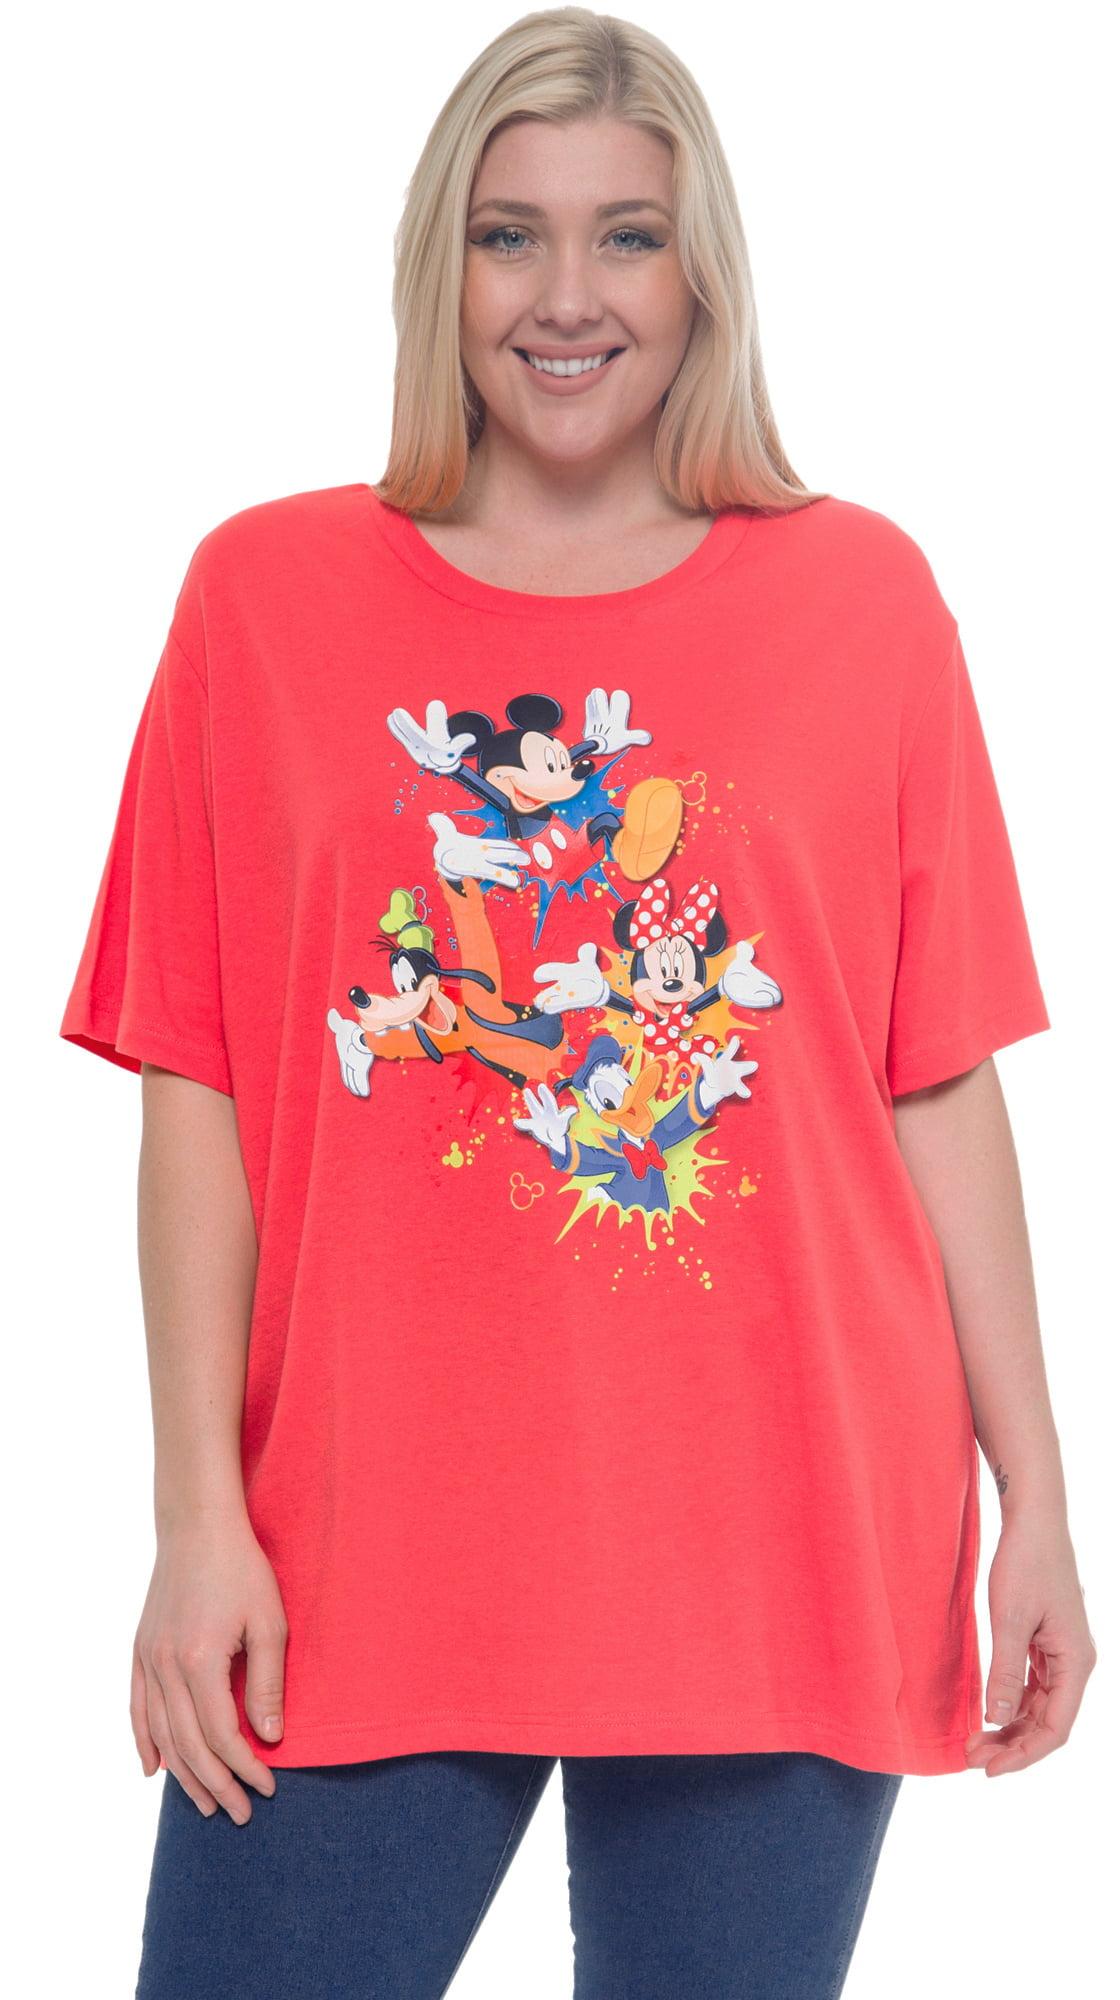 Disney Mickey Minnie Donald Goofy Plus Size T-Shirt Coral